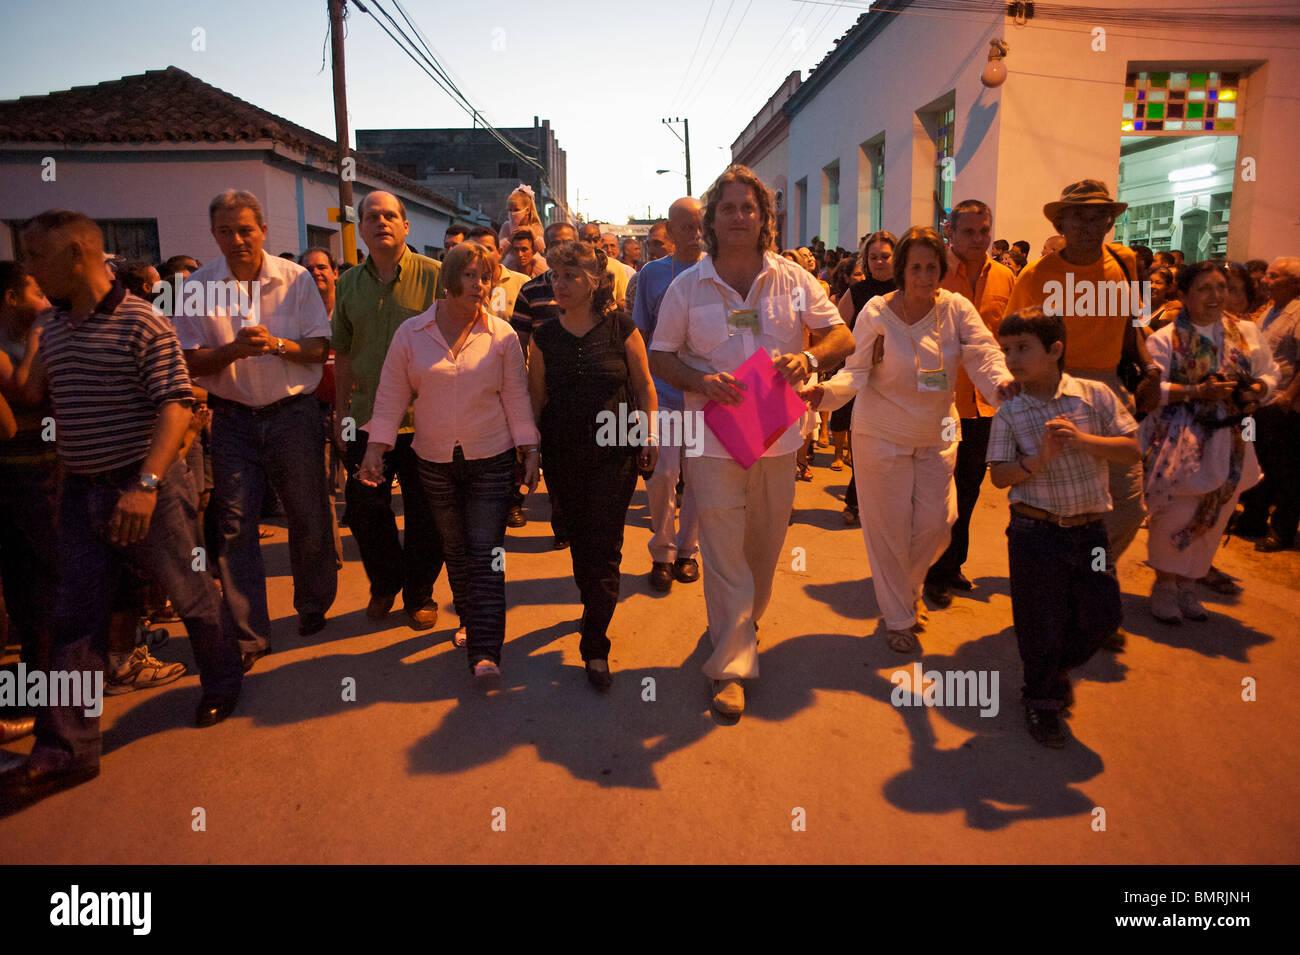 Desfile inaugural del Festival del Cine Pobre, Gibara, Cuba Imagen De Stock